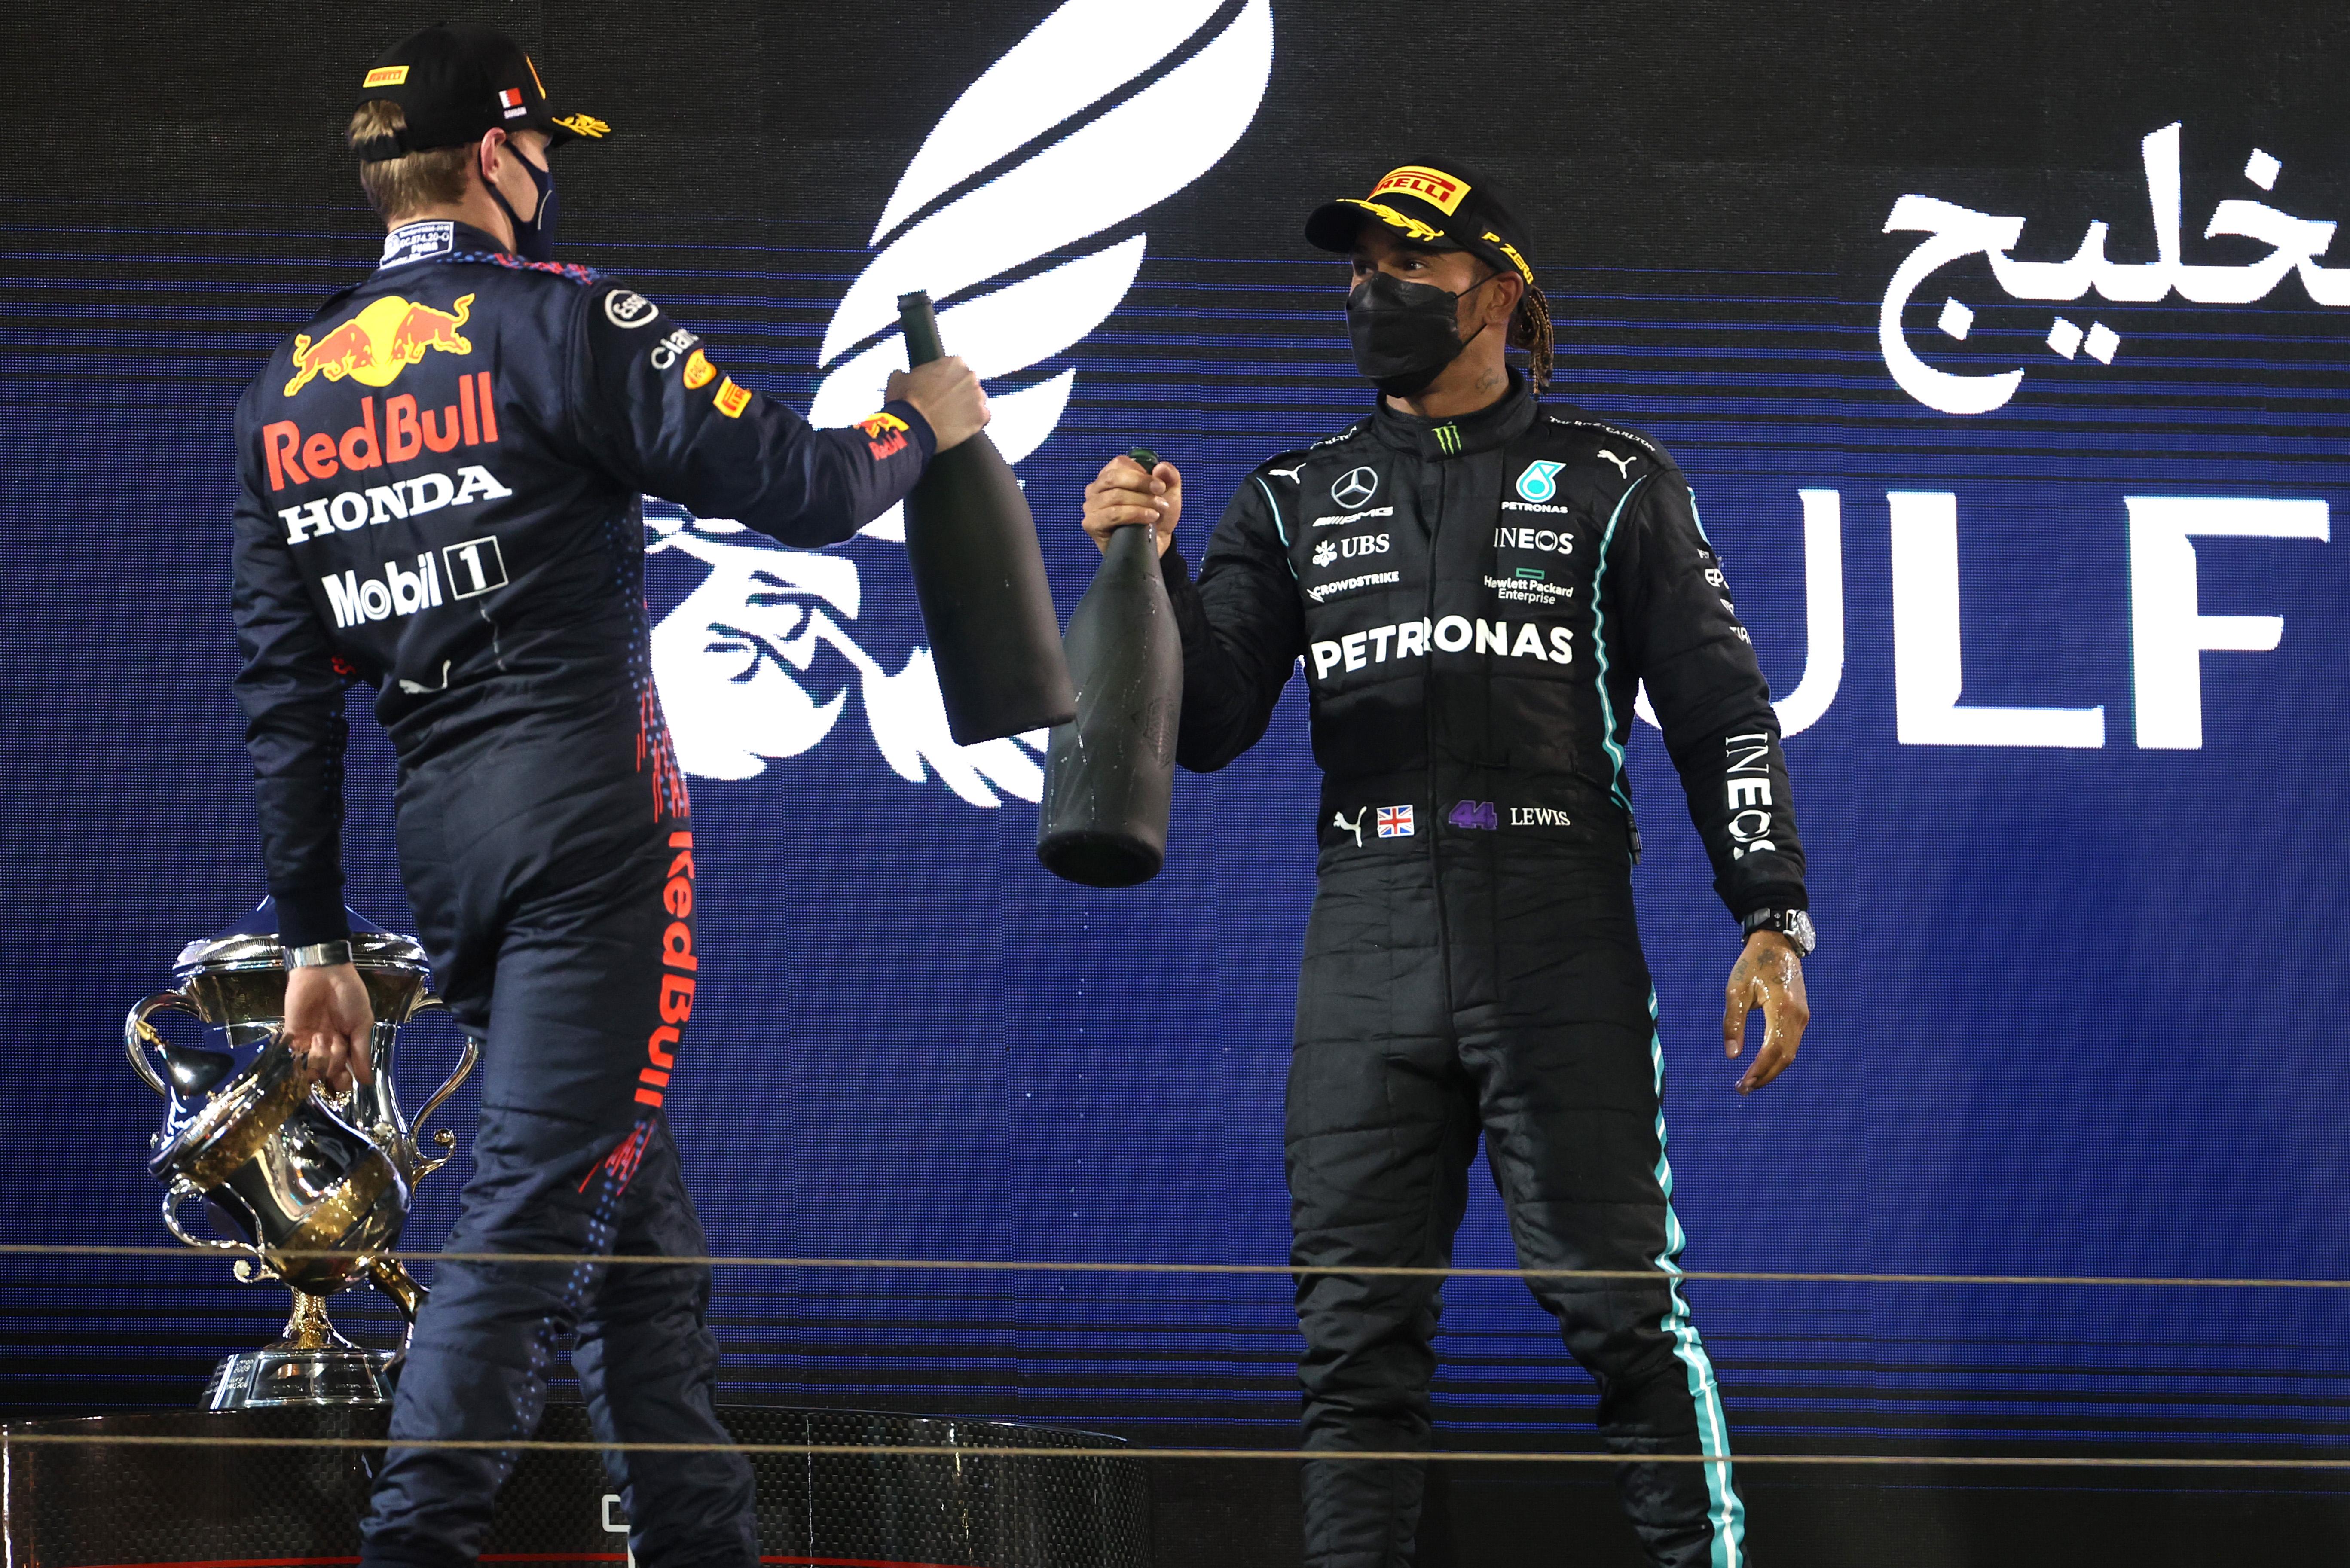 Max Verstappen Lewis hamilton Red Bull Mercedes F1 Bahrain 2021